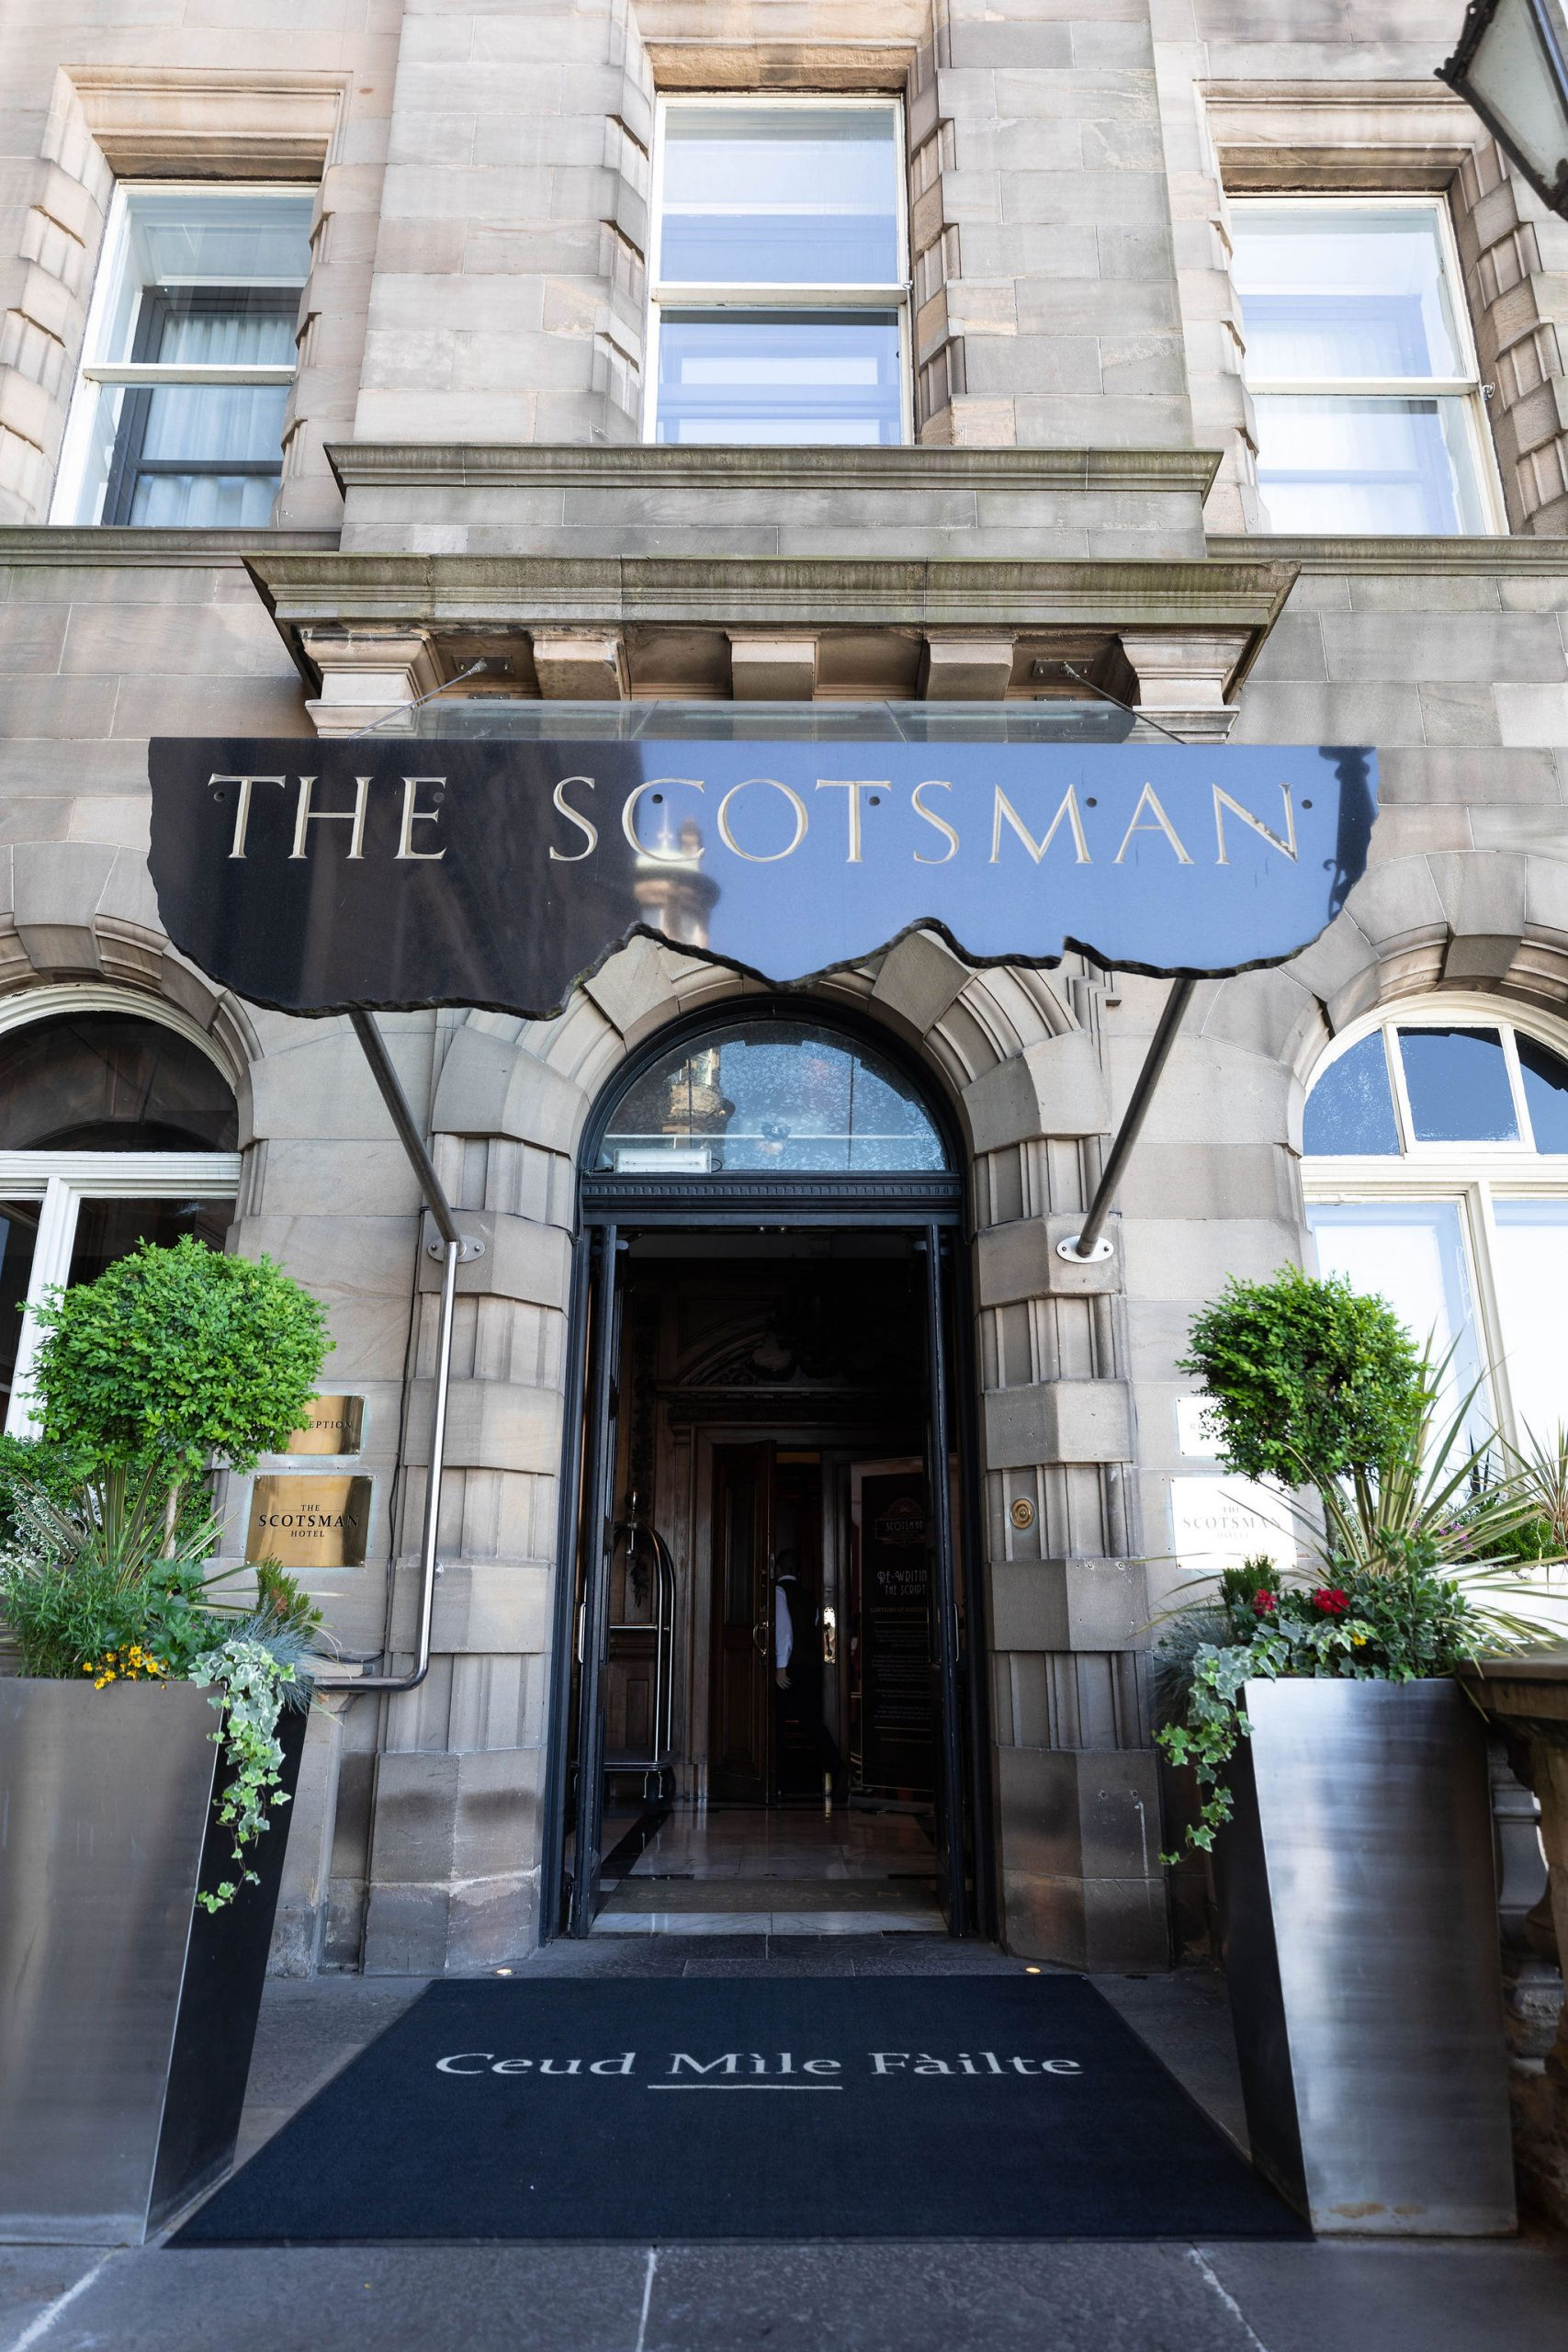 The Scotsman Hotel in Edinburgh, Scotland, United Kingdom Accommodation Luxury Review by Annie Fairfax